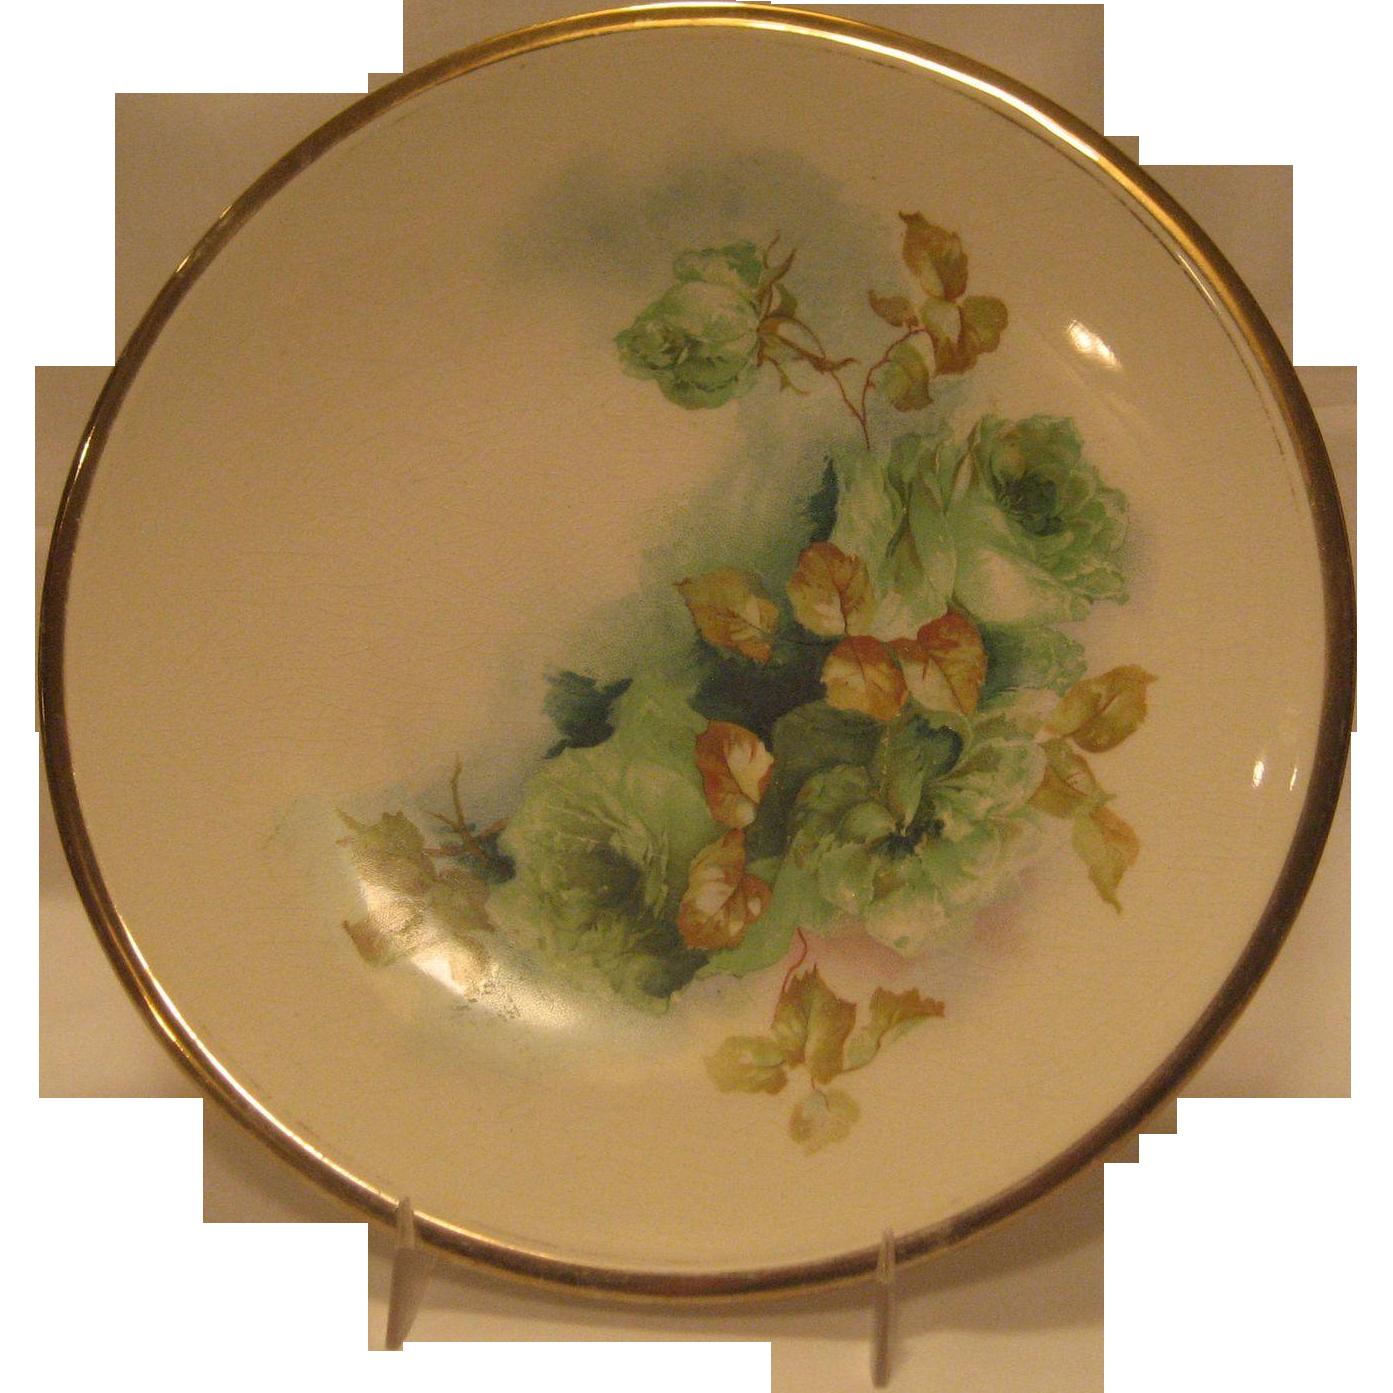 La Francaise Porcelain China Floral Plate - Hand Painted